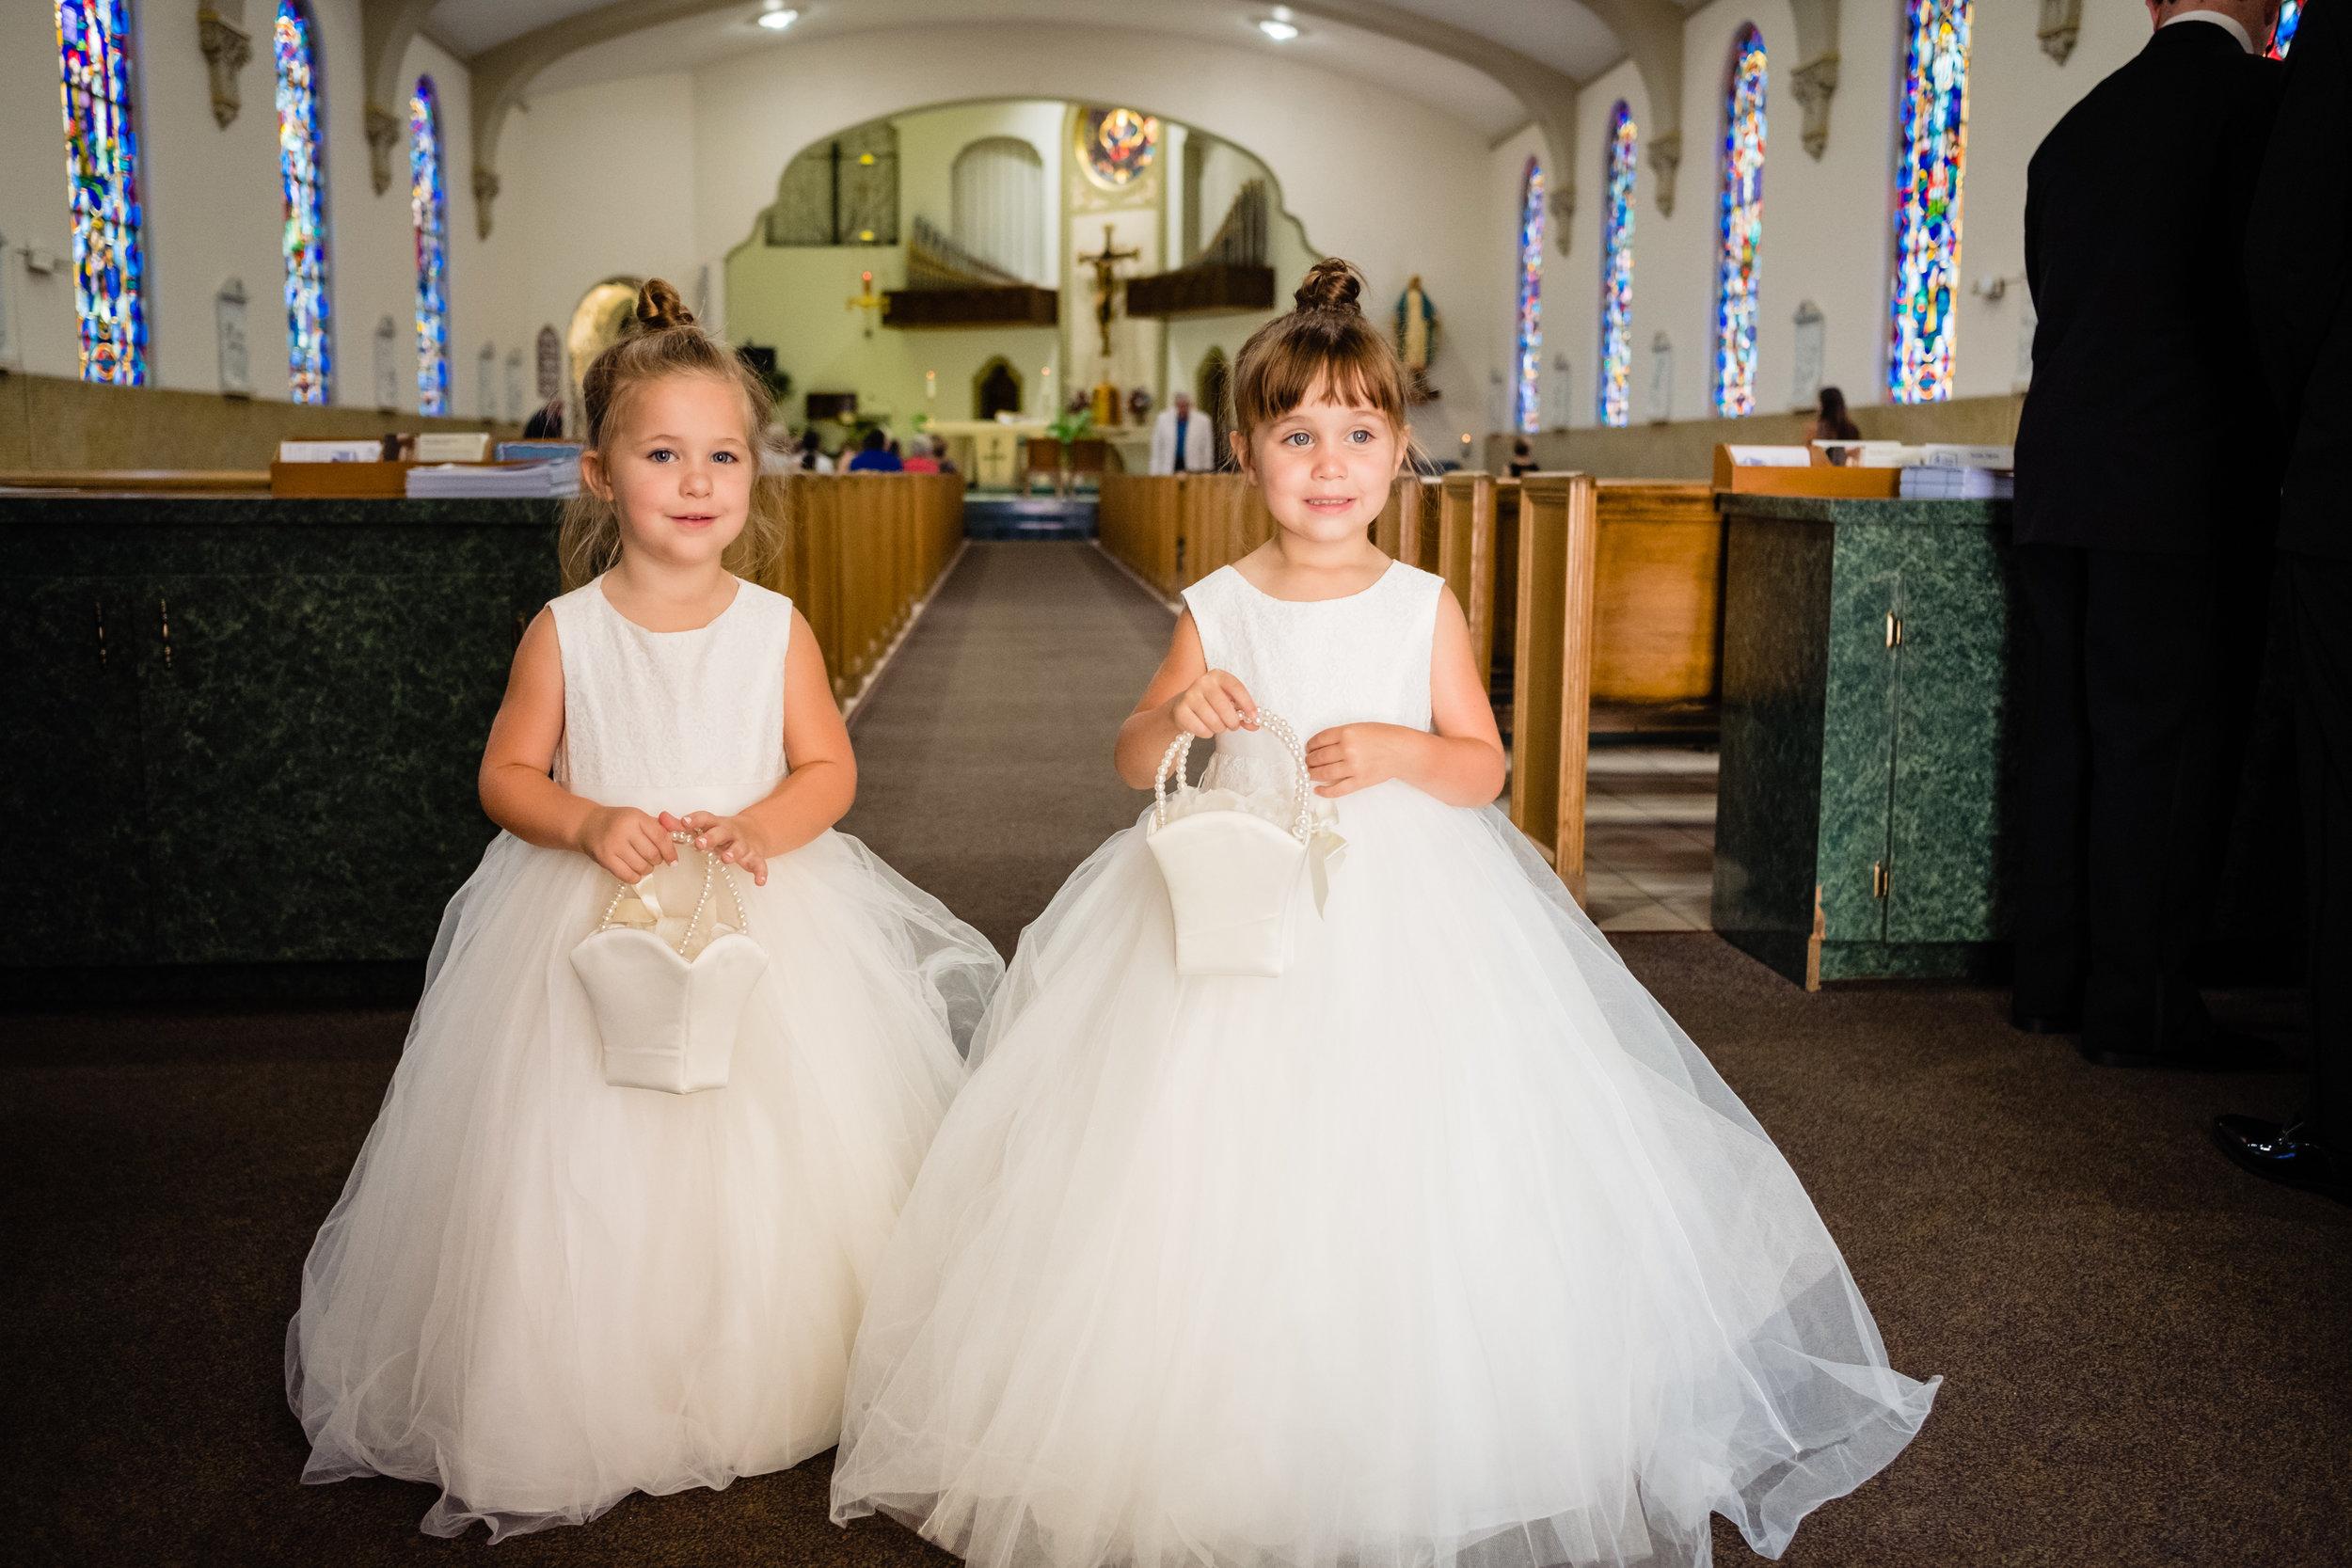 HAH_Zoe and Daniel_Clearwater Wedding_15_2018.jpg